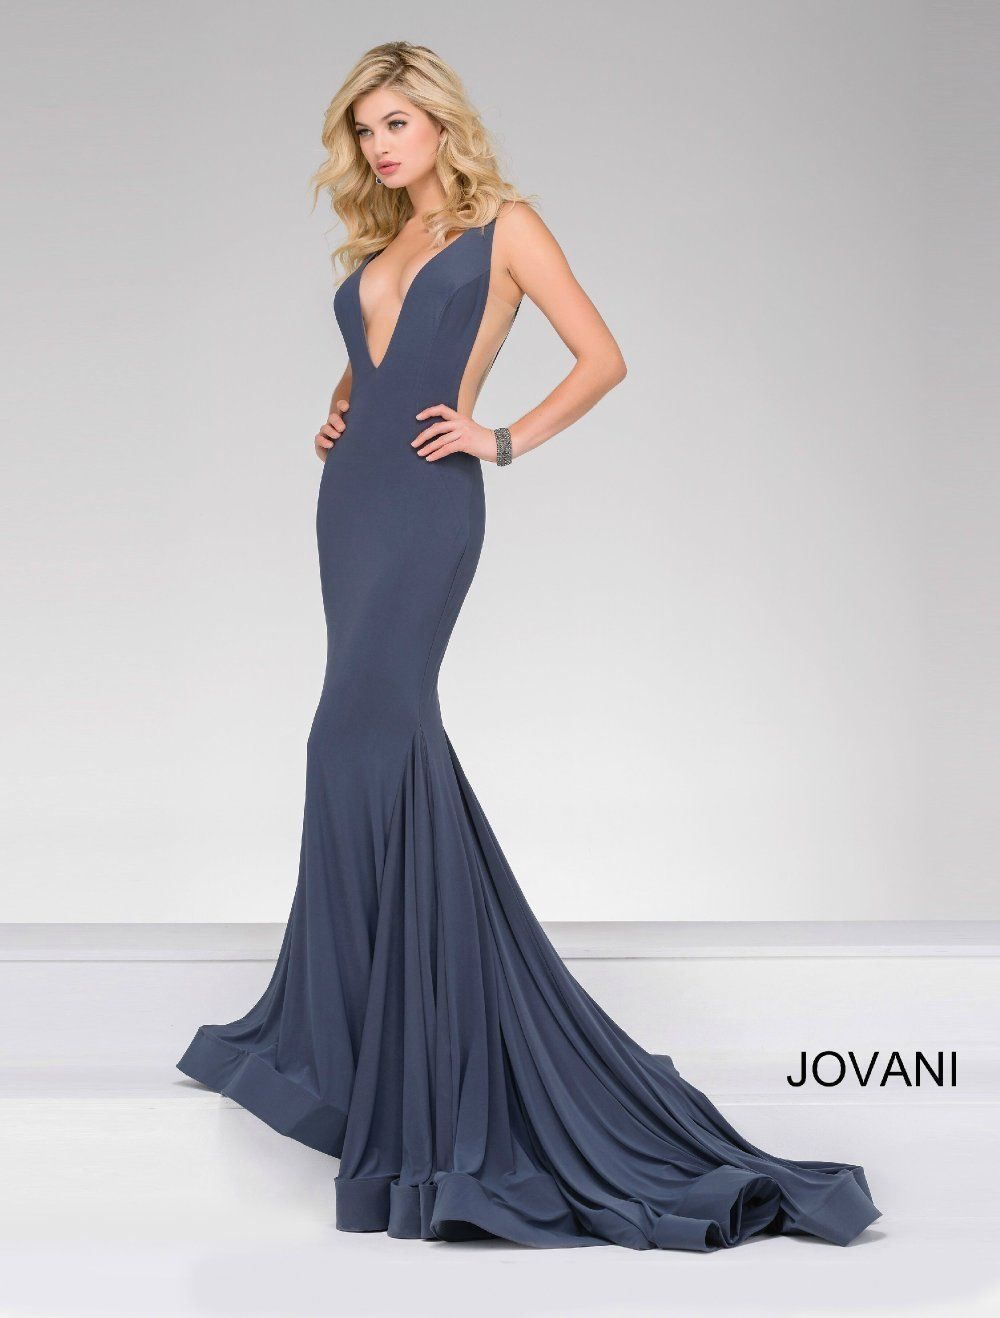 Nice awesome jovani dress gown prom price guaranteelayaway